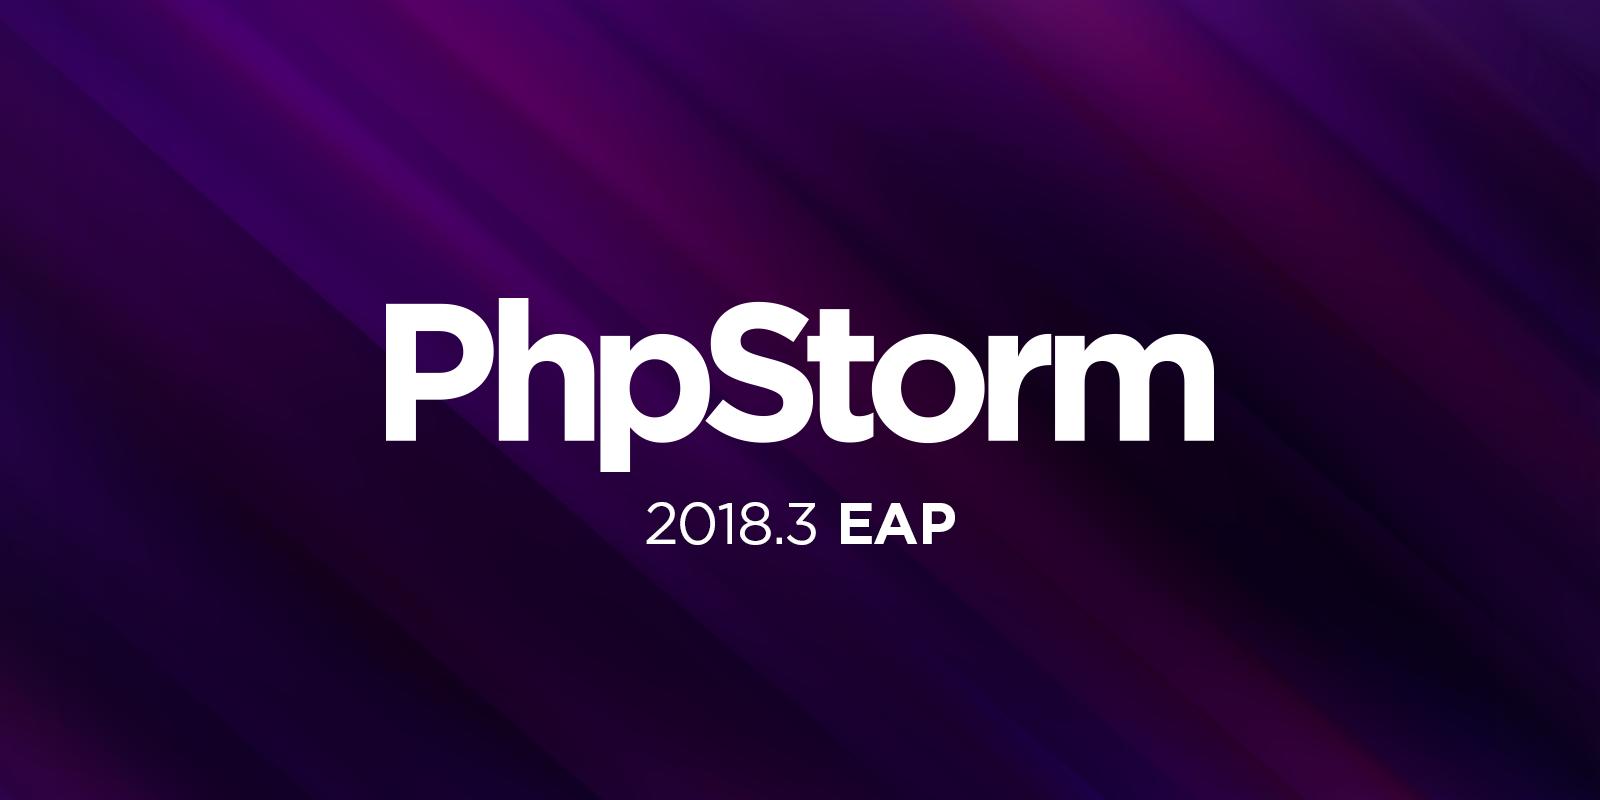 PhpStorm 2018.3 EAP